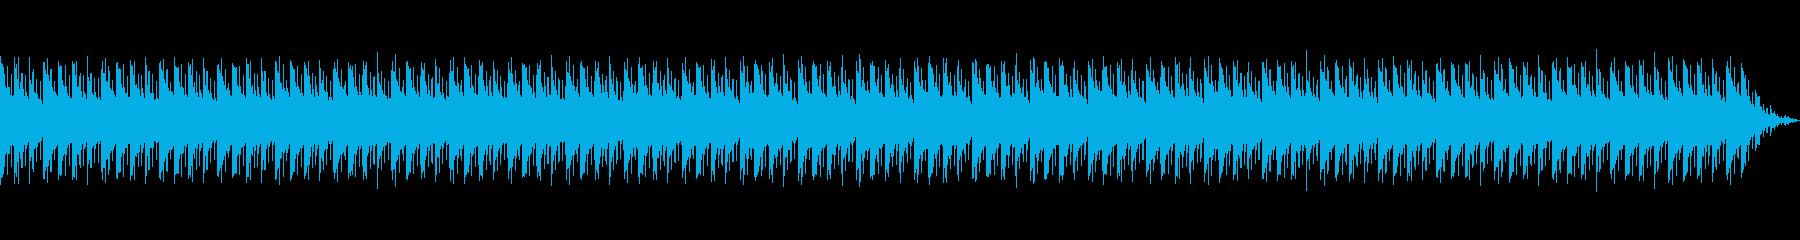 Vtuberの配信 開始前・待機BGMの再生済みの波形